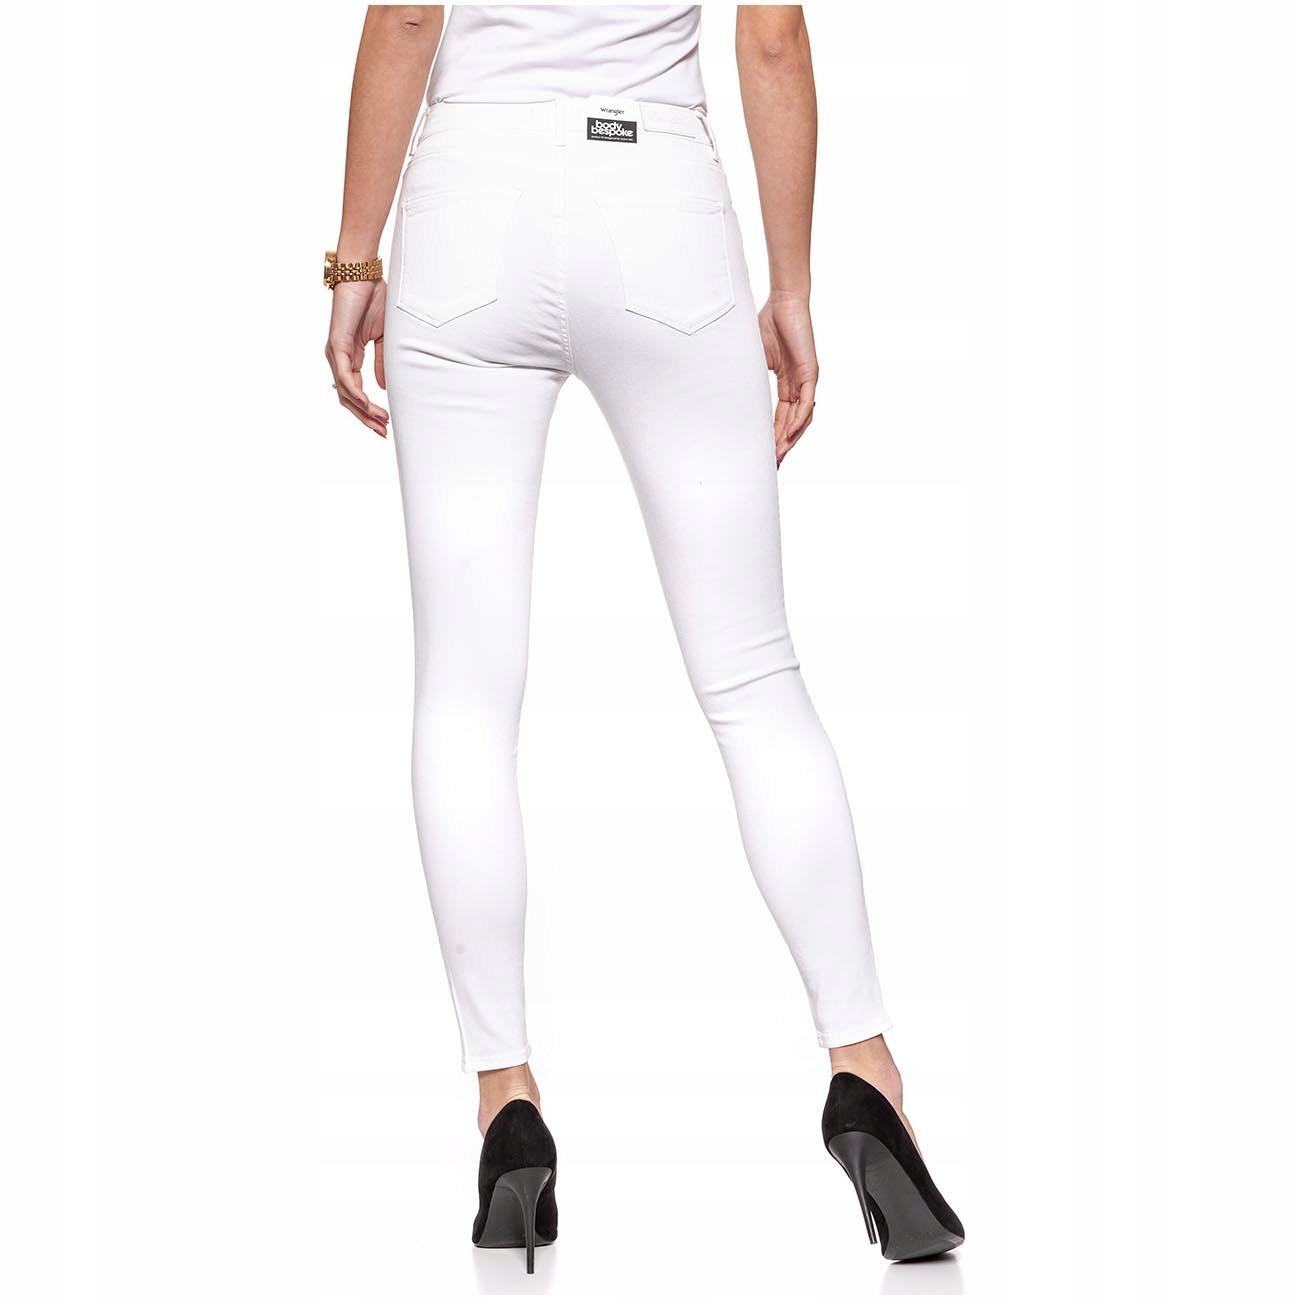 Wrangler High Skinny Spodnie Damskie Jeans W28 L32